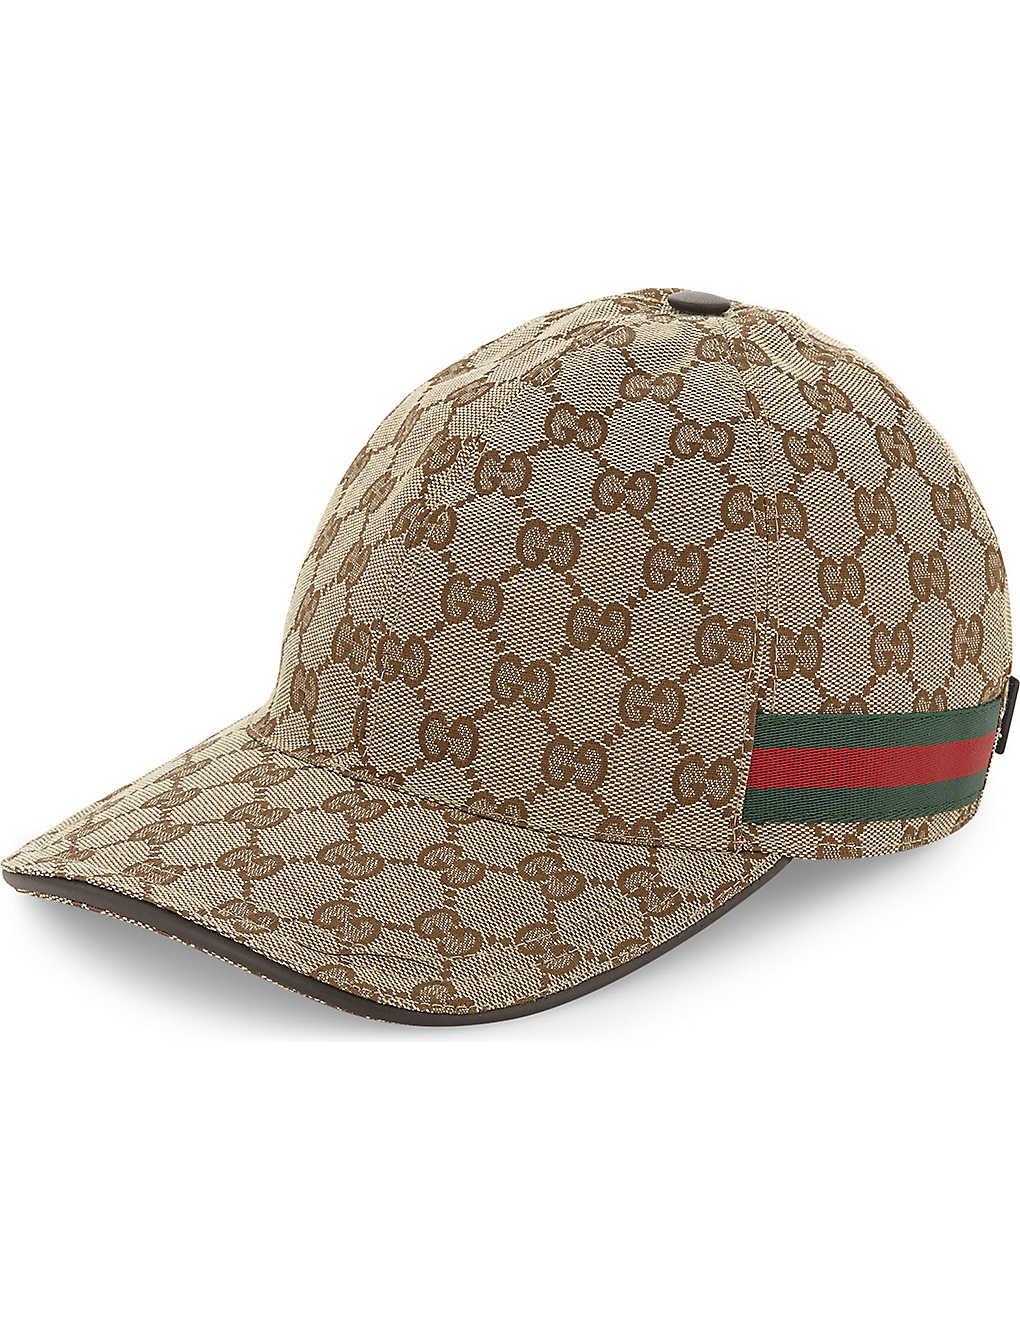 06873edcd67 GUCCI - GG Web stripe baseball cap